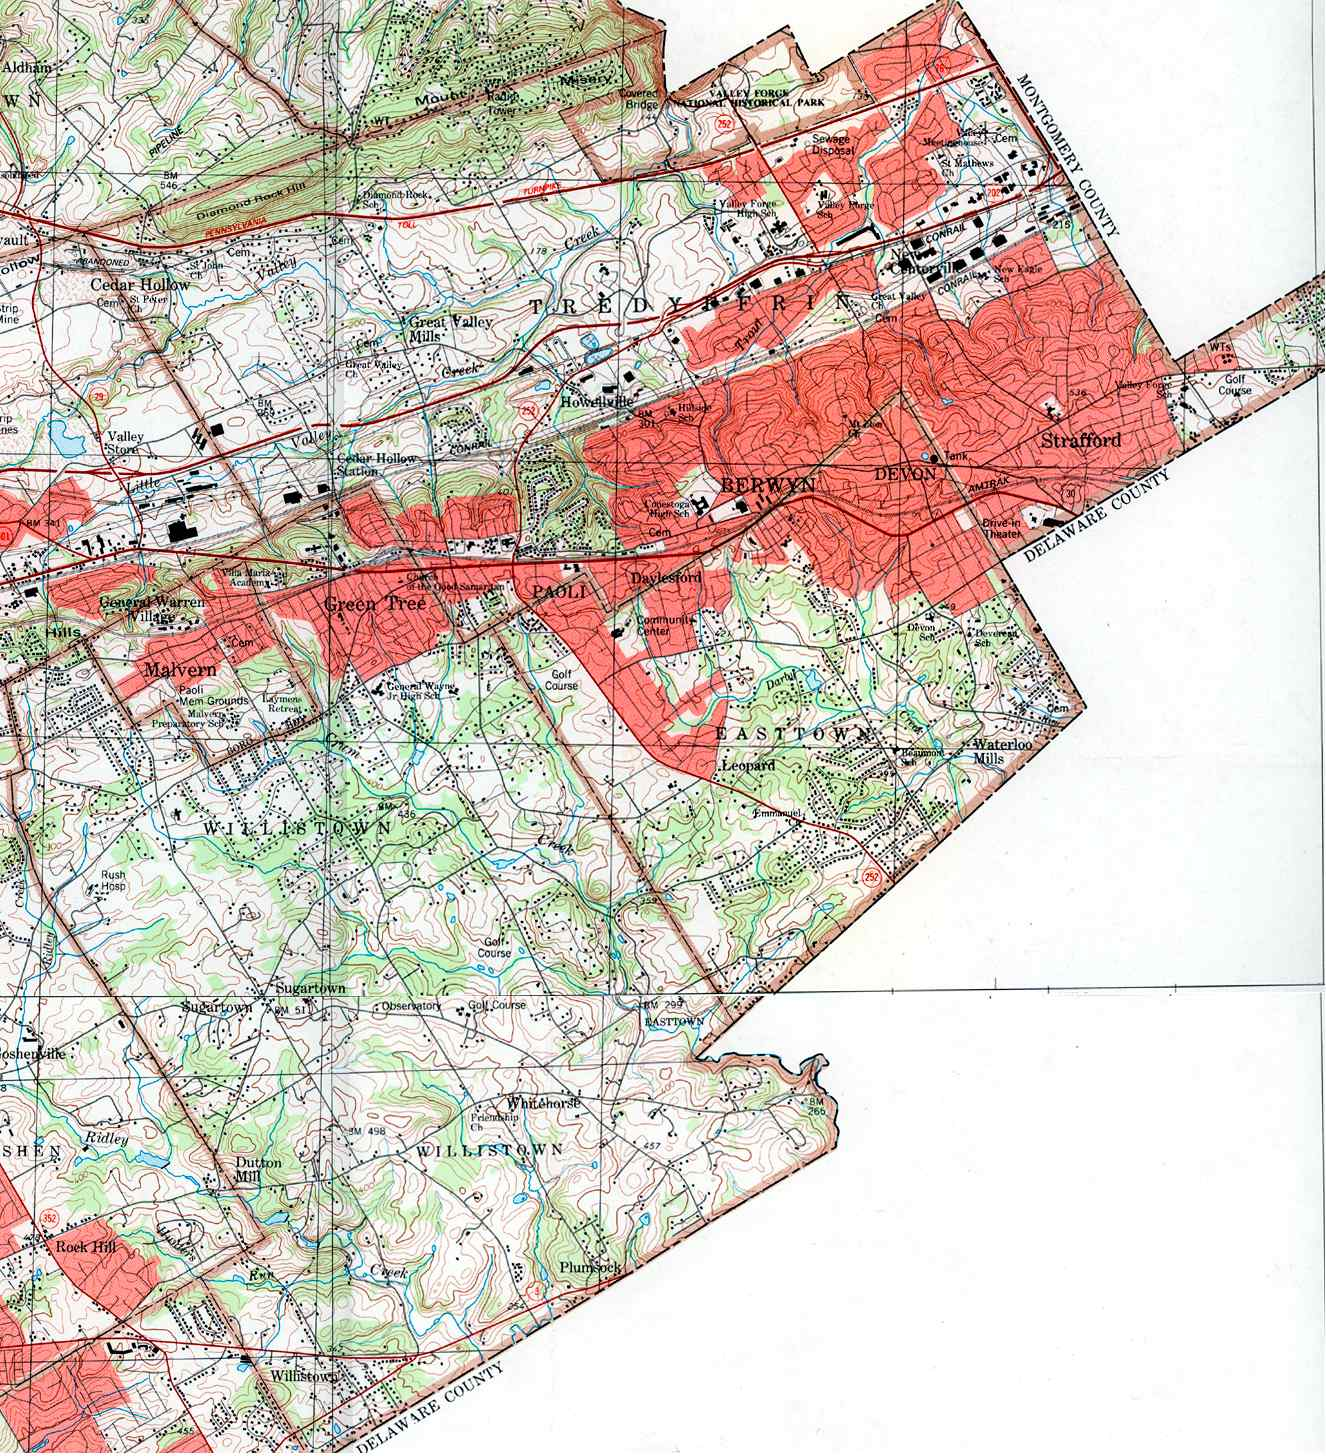 Chester County Pennsylvania Township Maps - Malvern Pennsylvania On Us Map